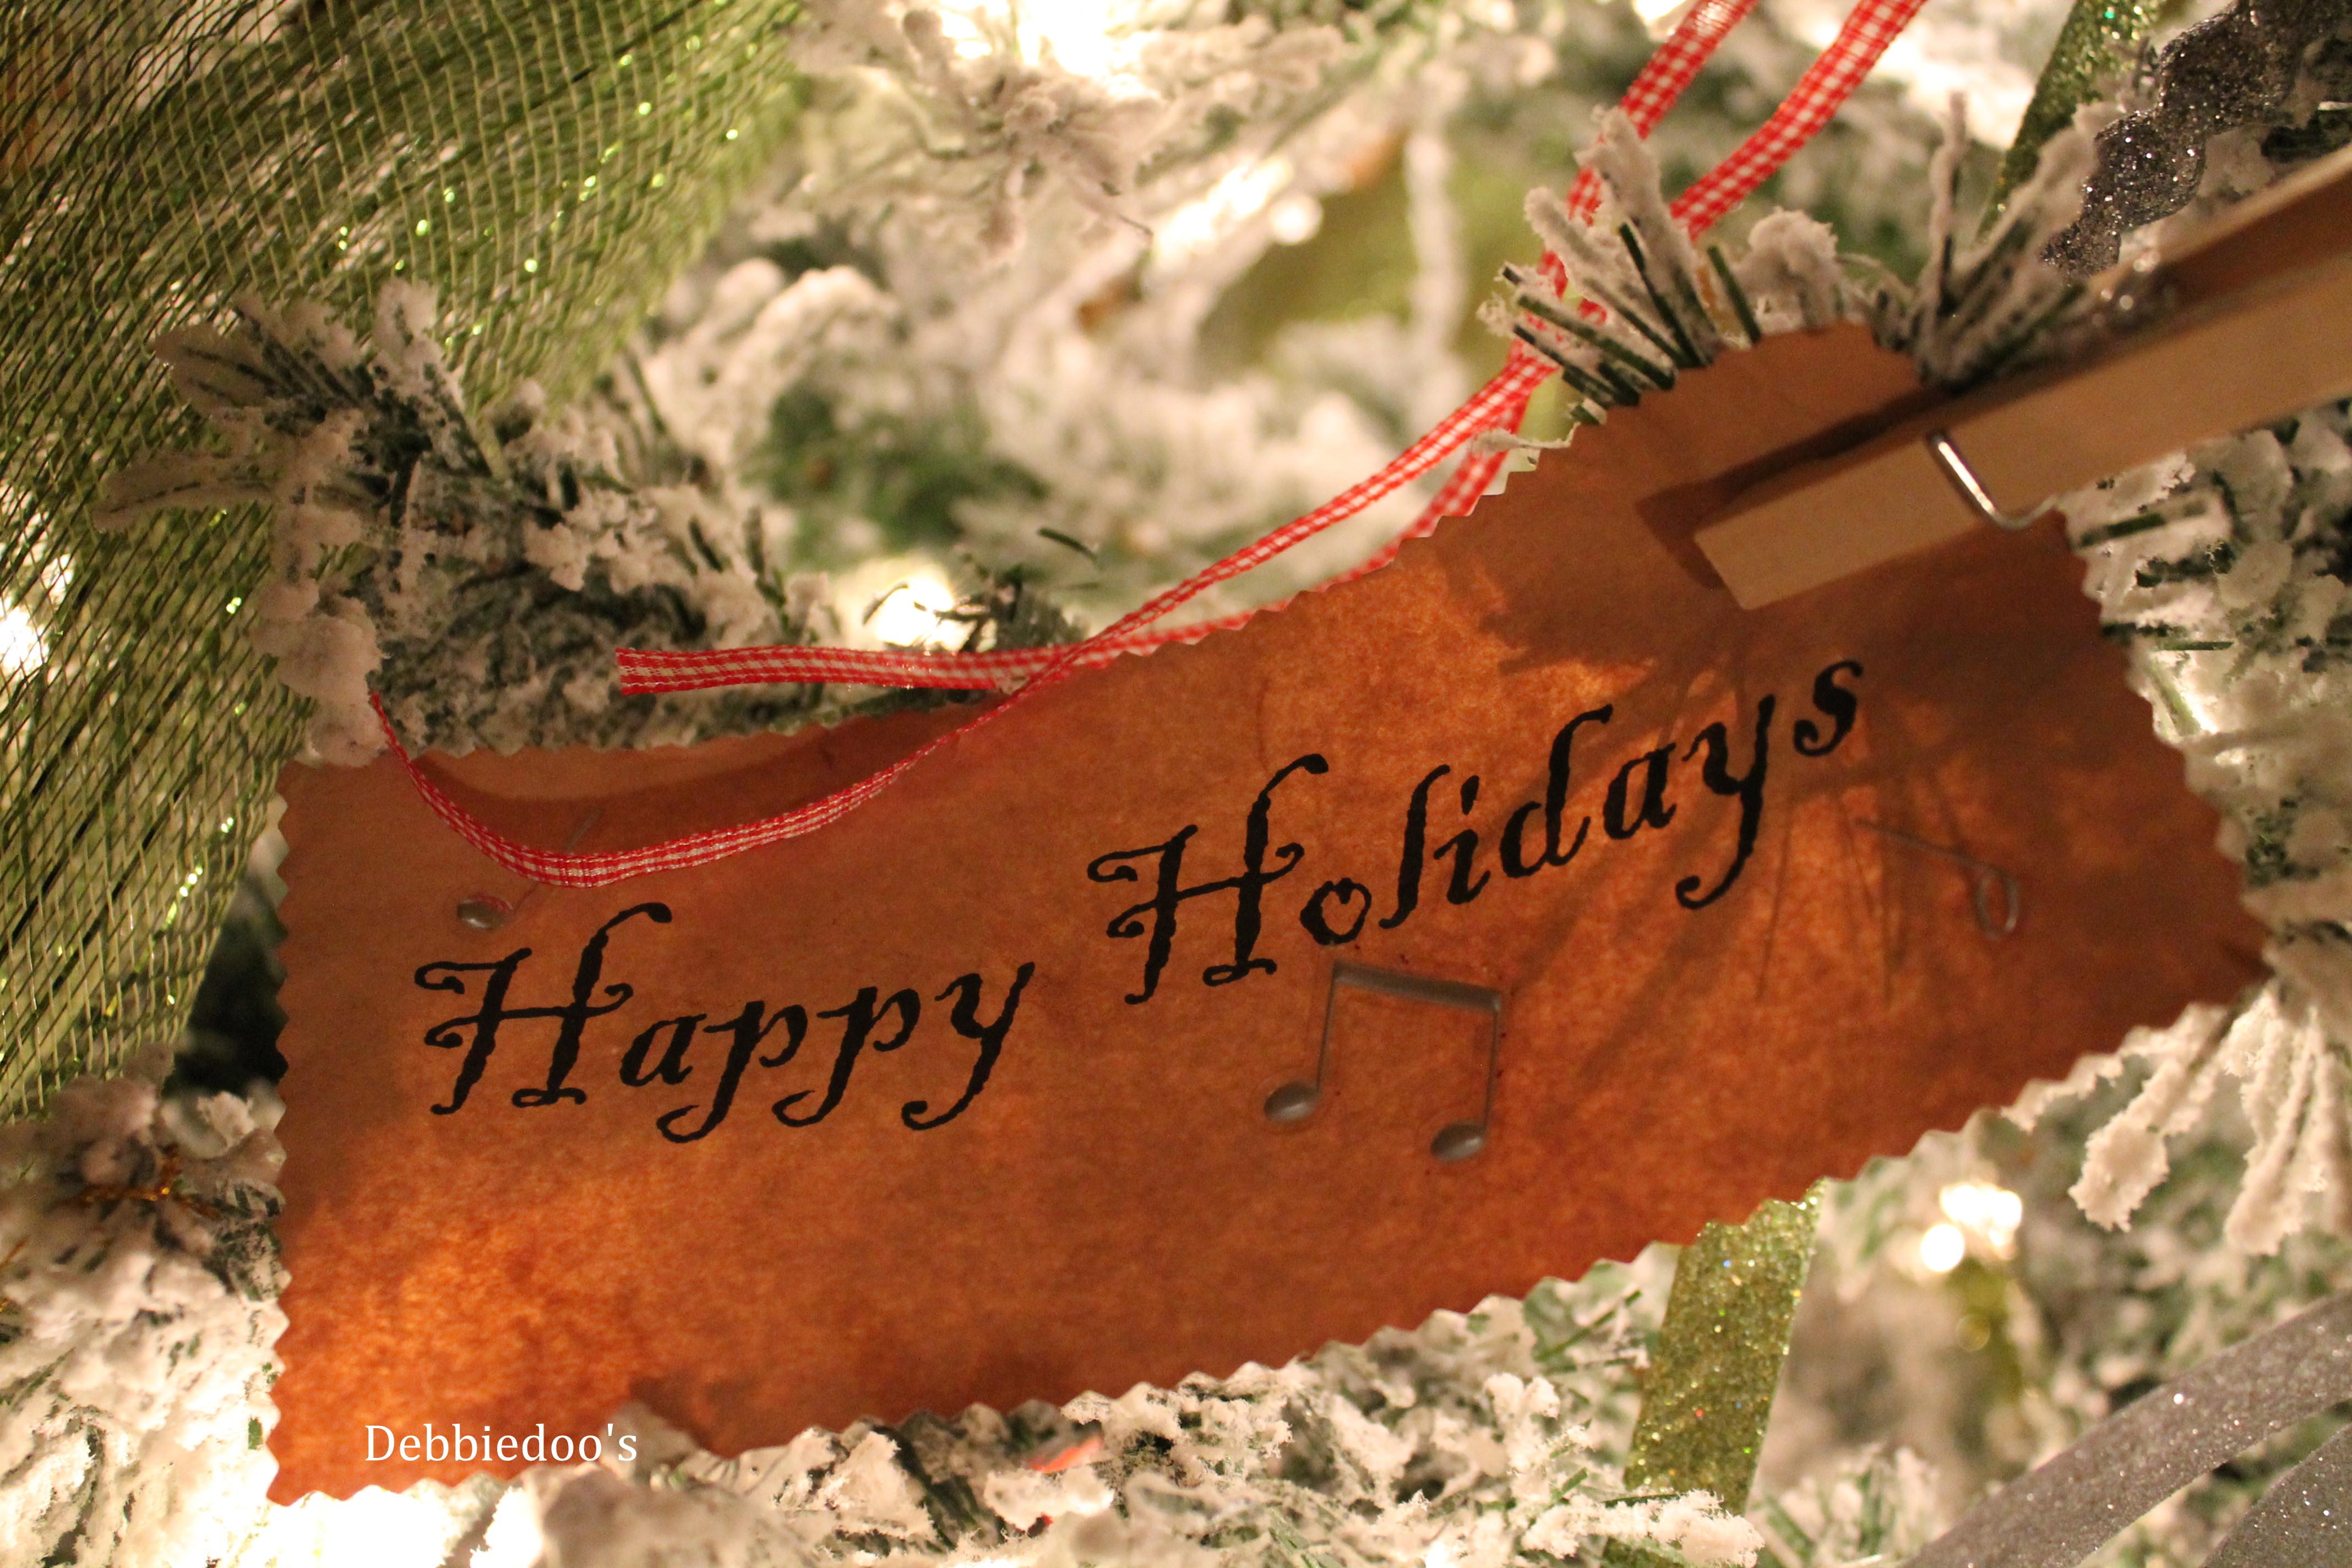 Pottery barn Holiday garland knock off